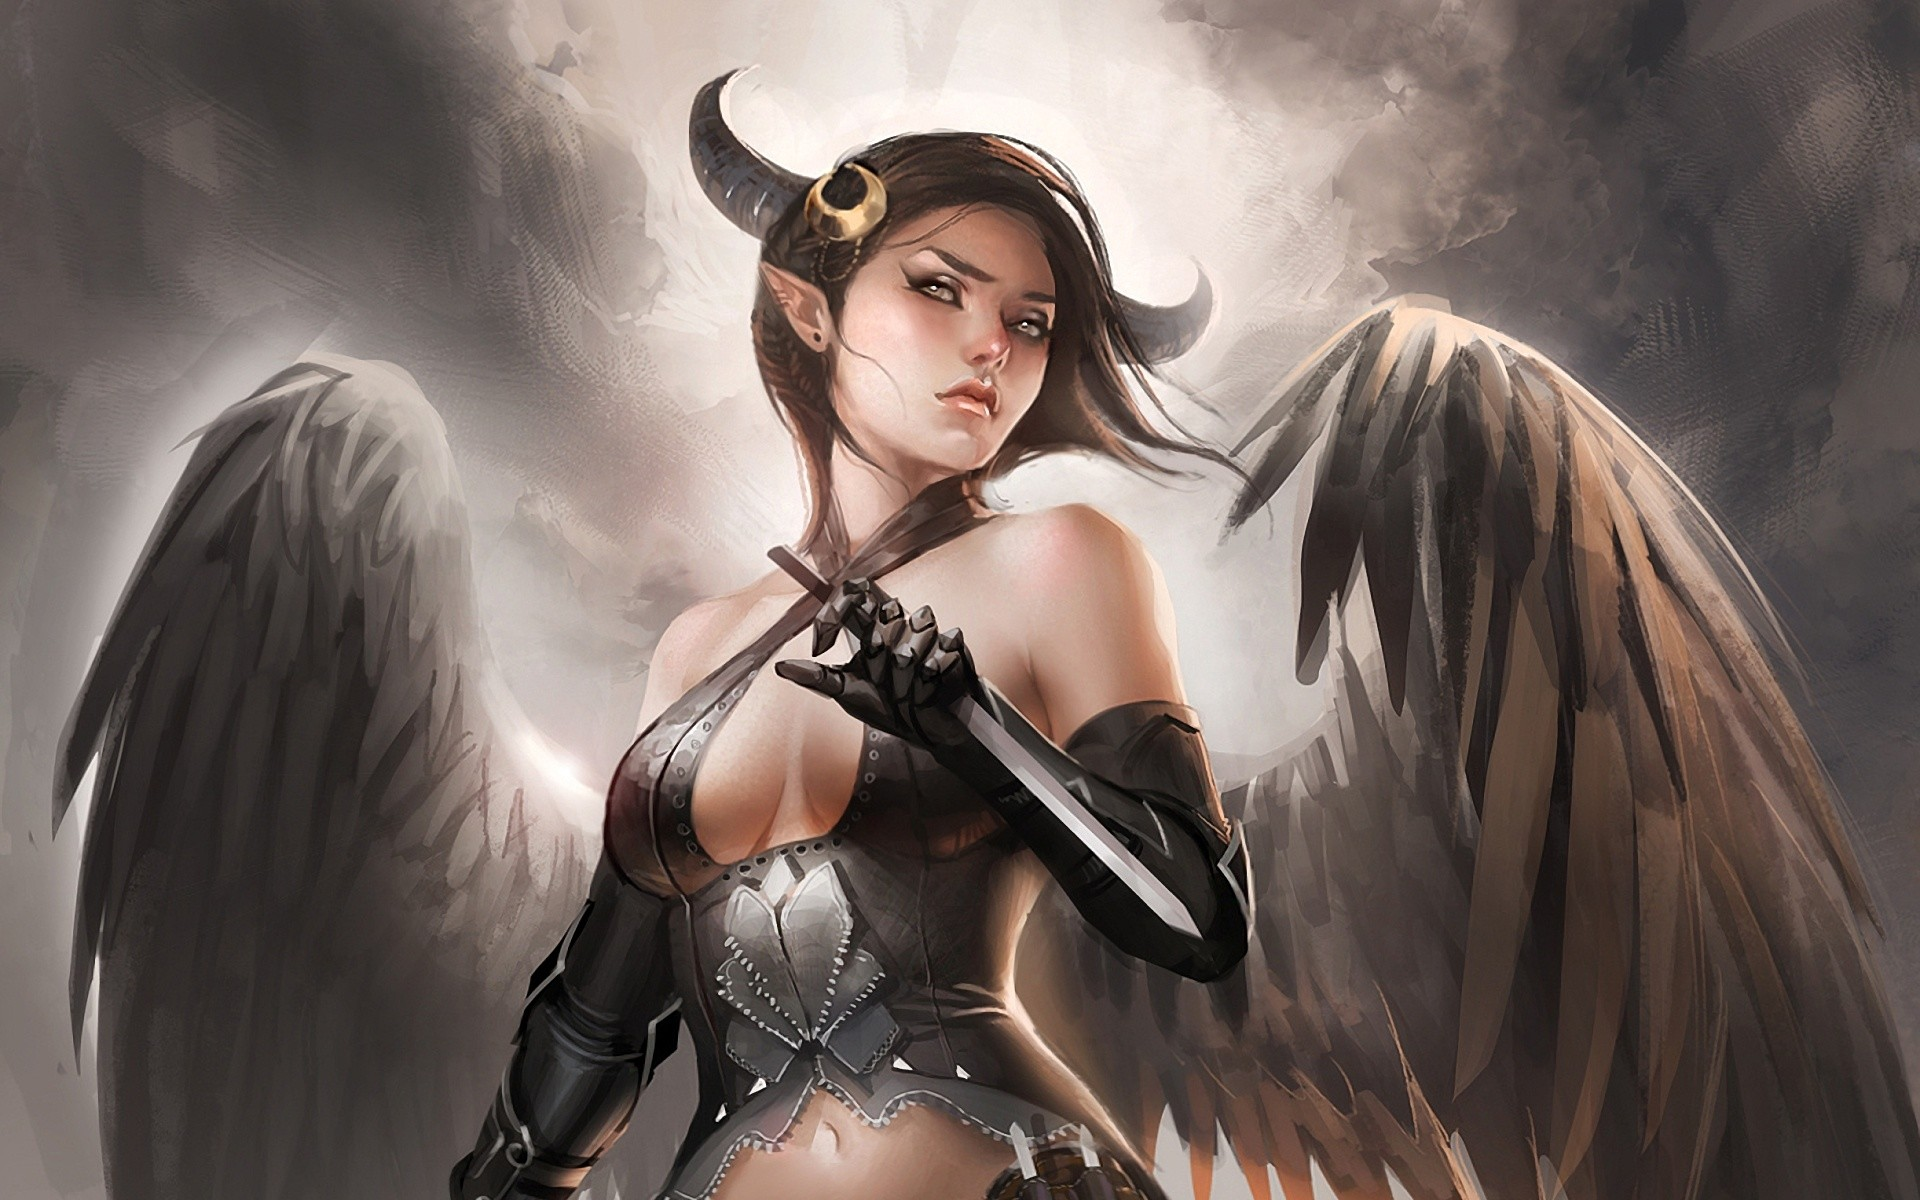 Angel and devil wallpaper 61 images - Angel girl wallpaper ...